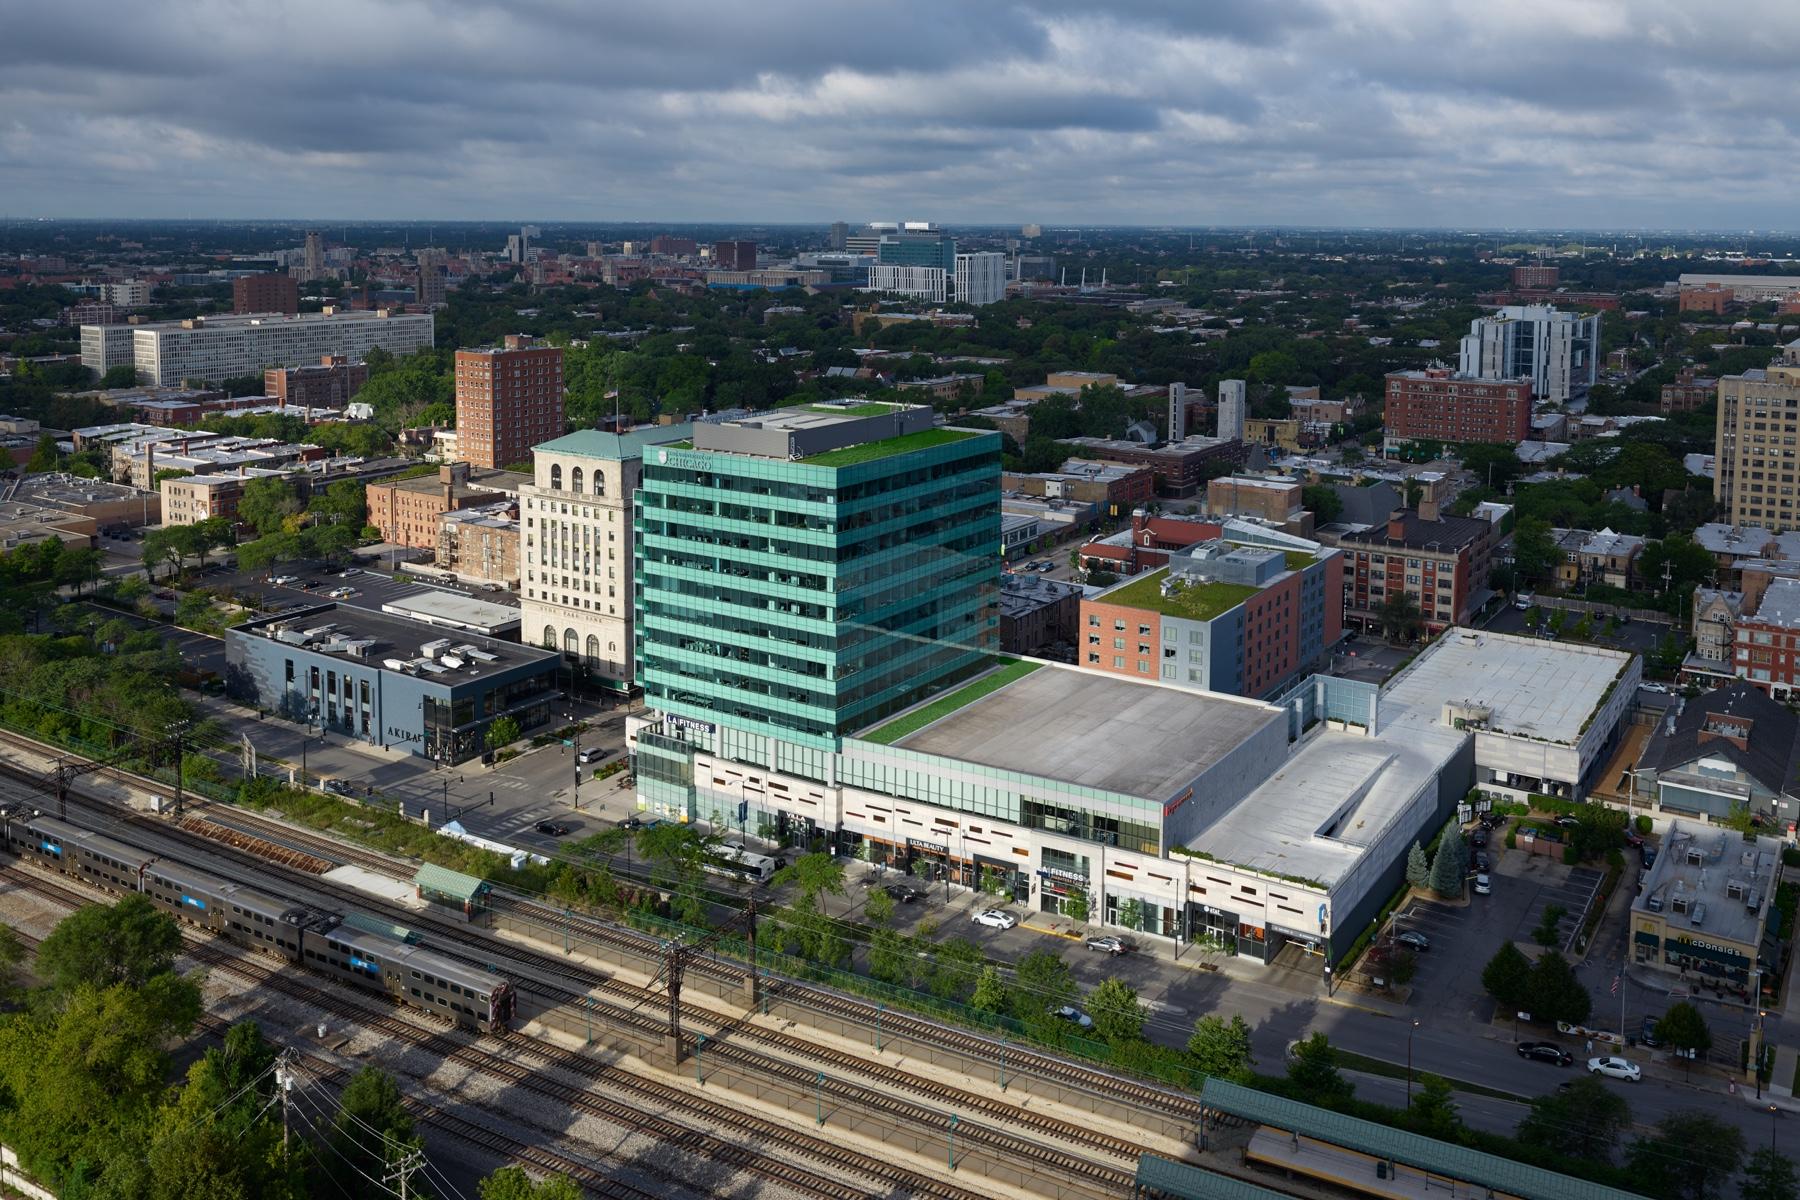 Harper Court Aerial View in Chicago, IL